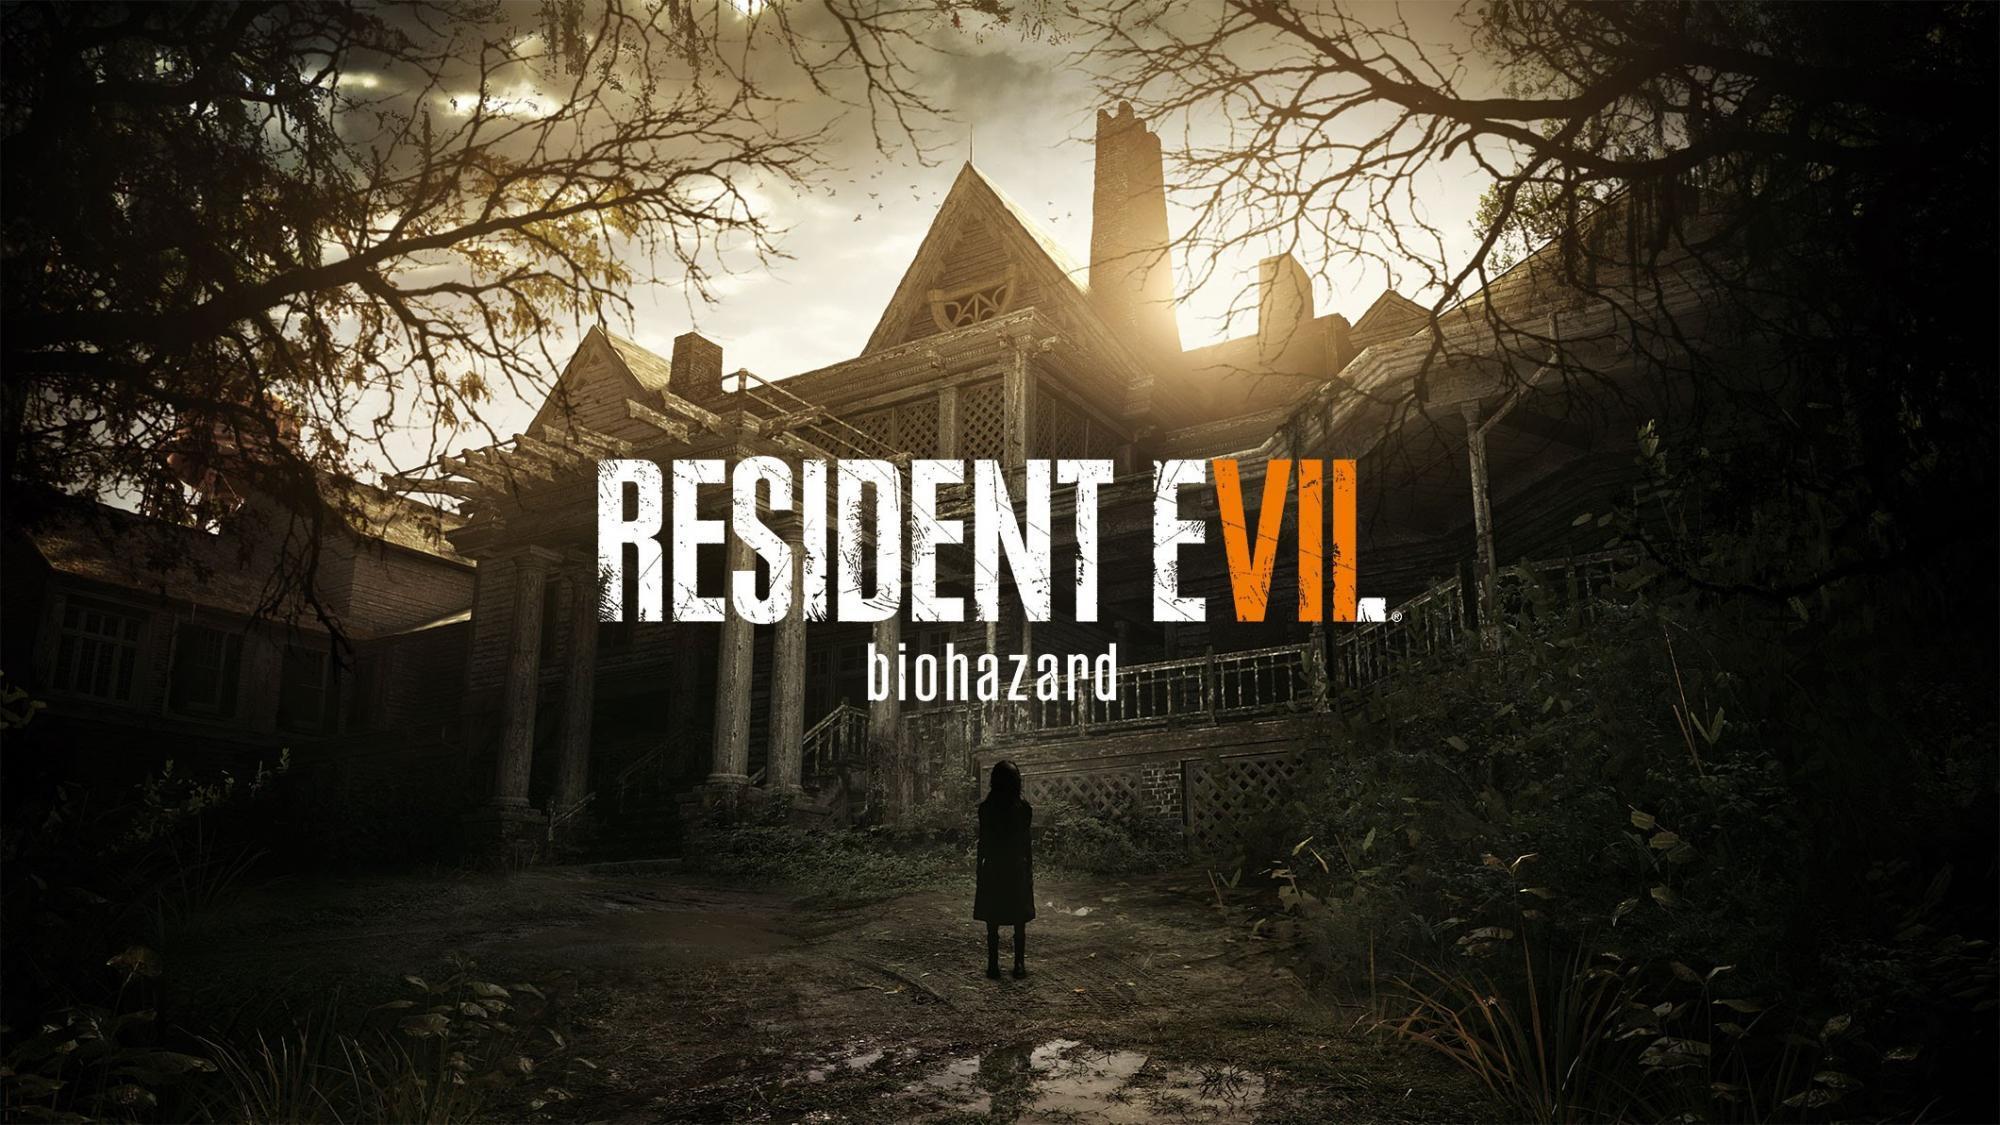 Resident Evil 7 biohazard (reseña)